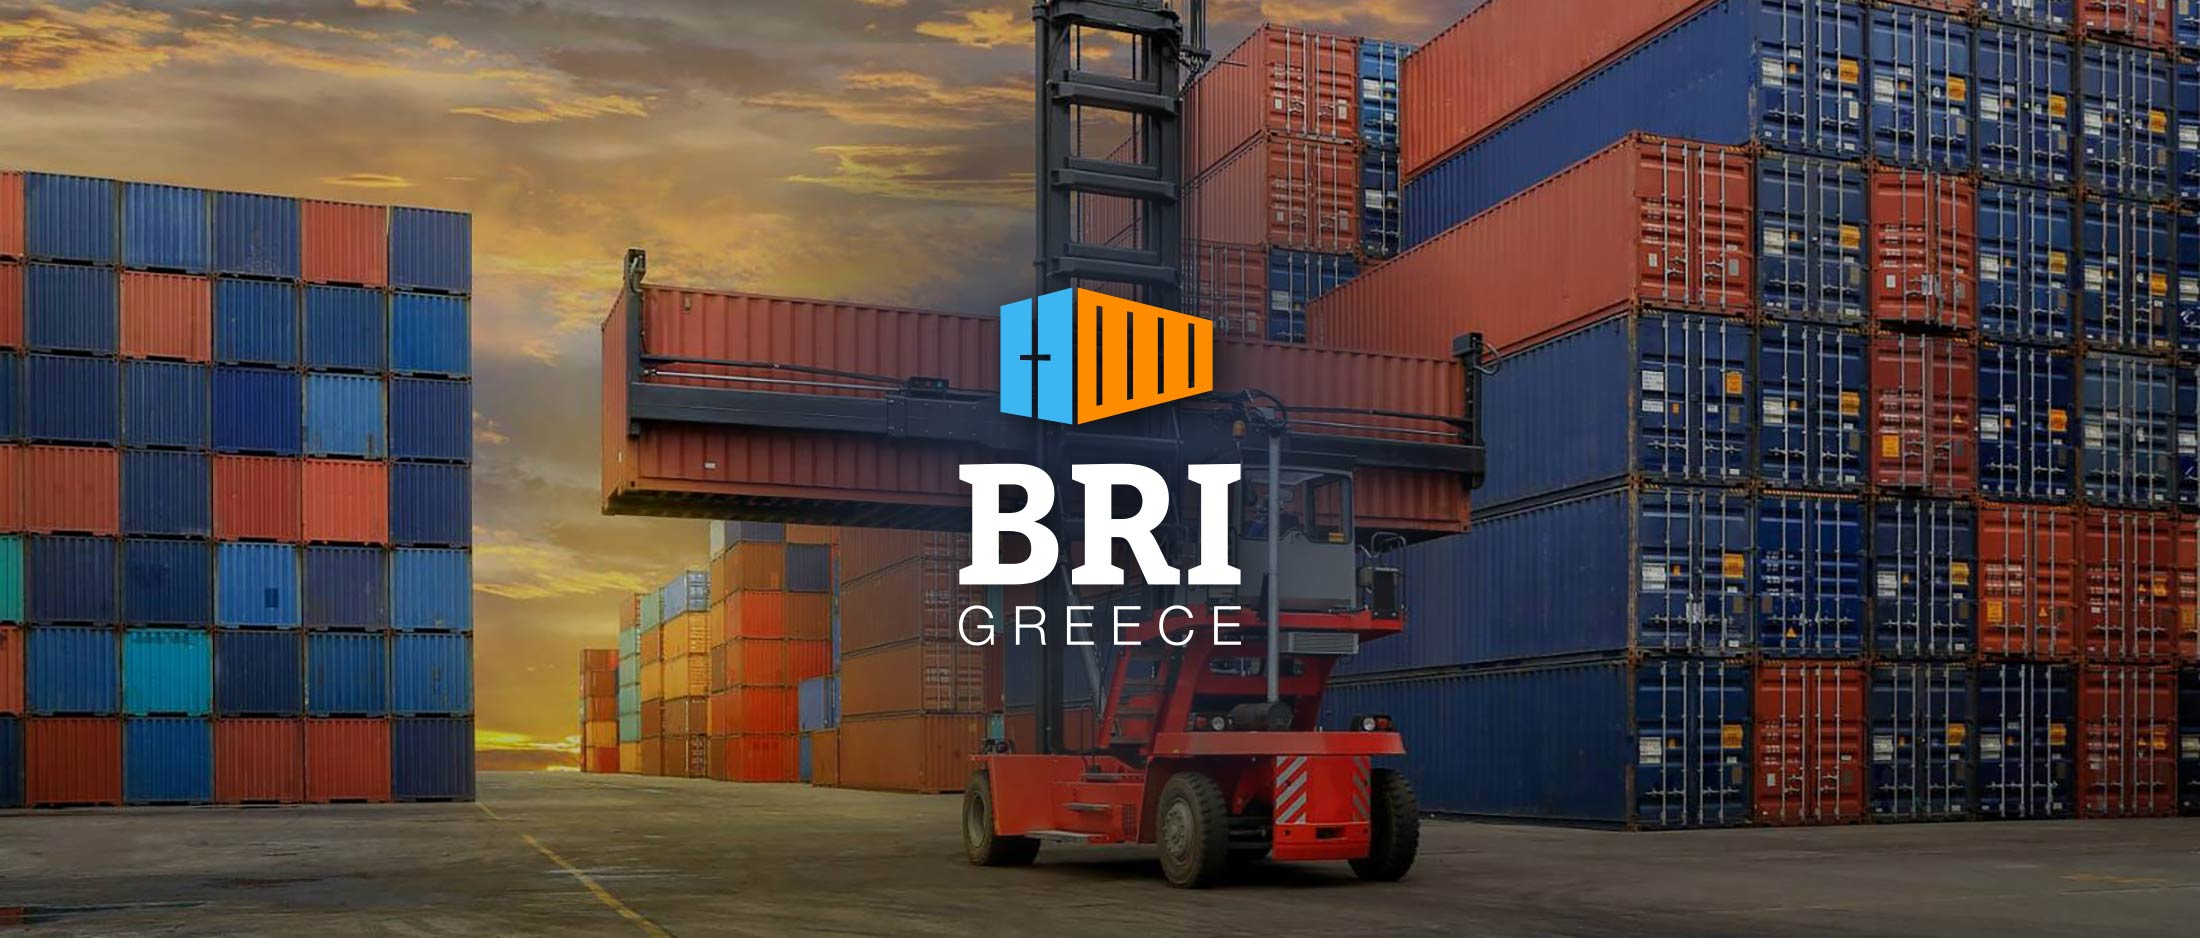 Concept inspiration for logo, branding and website design for BRI Greece, by Reform.